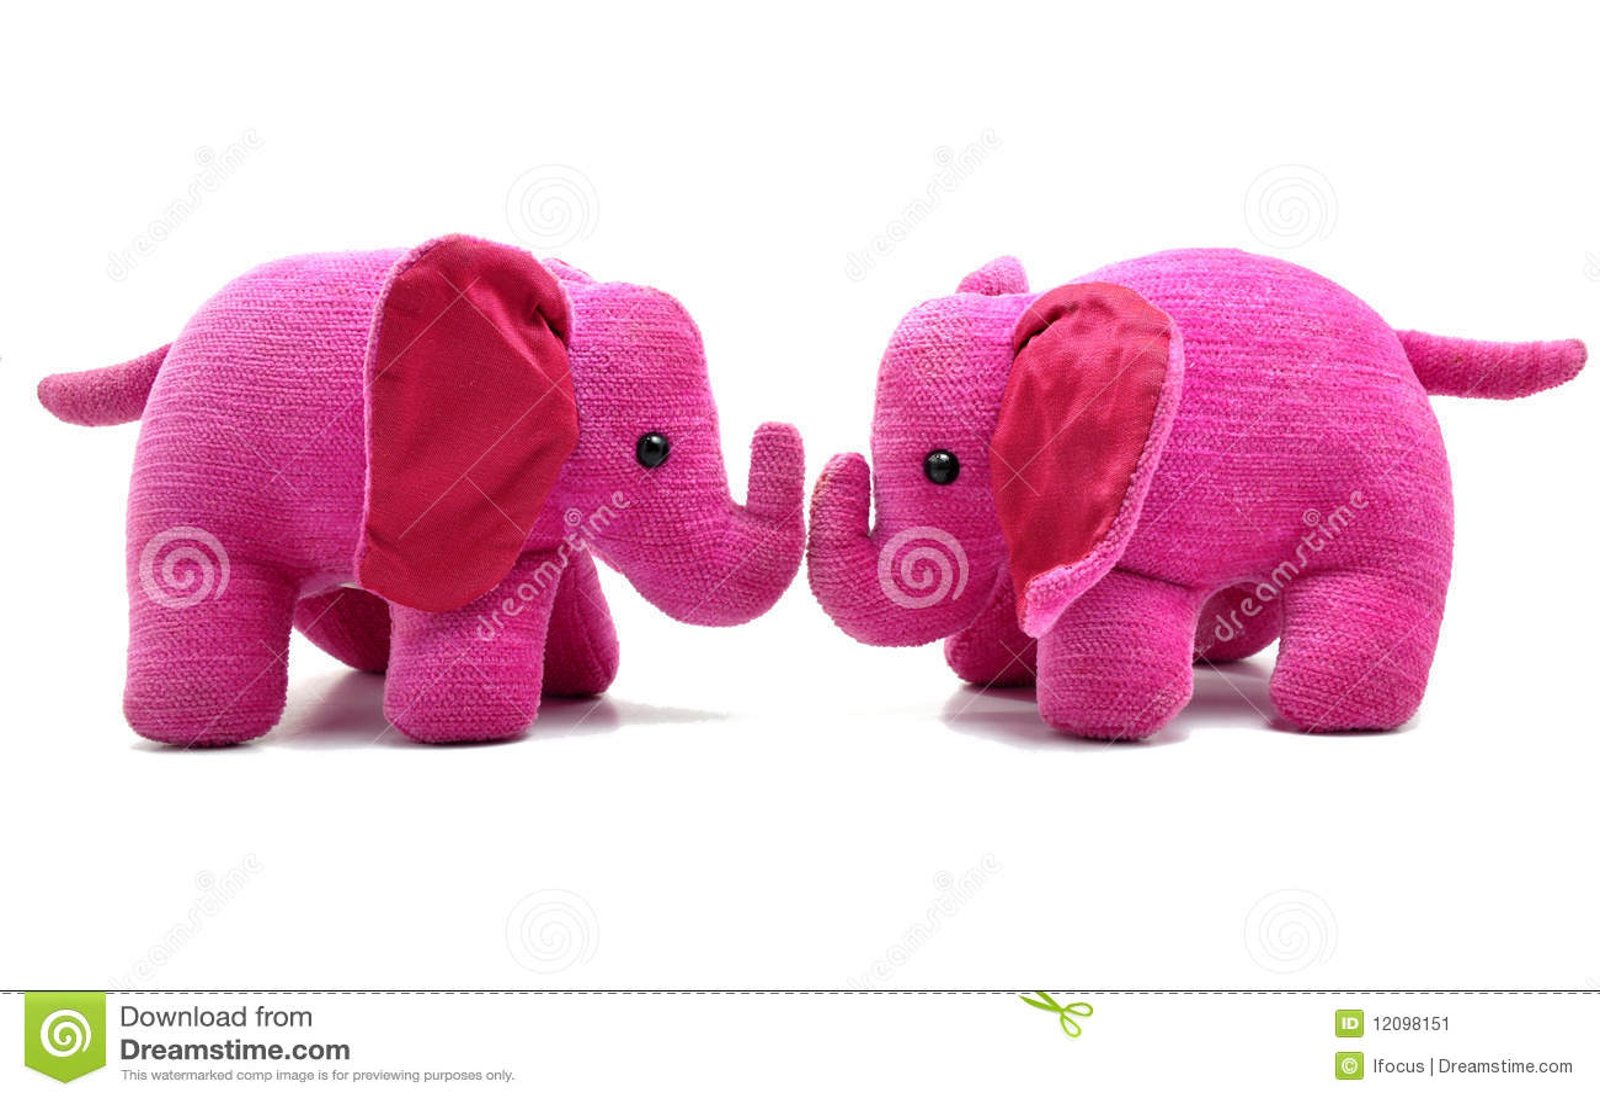 Cute pink elephant - photo#22